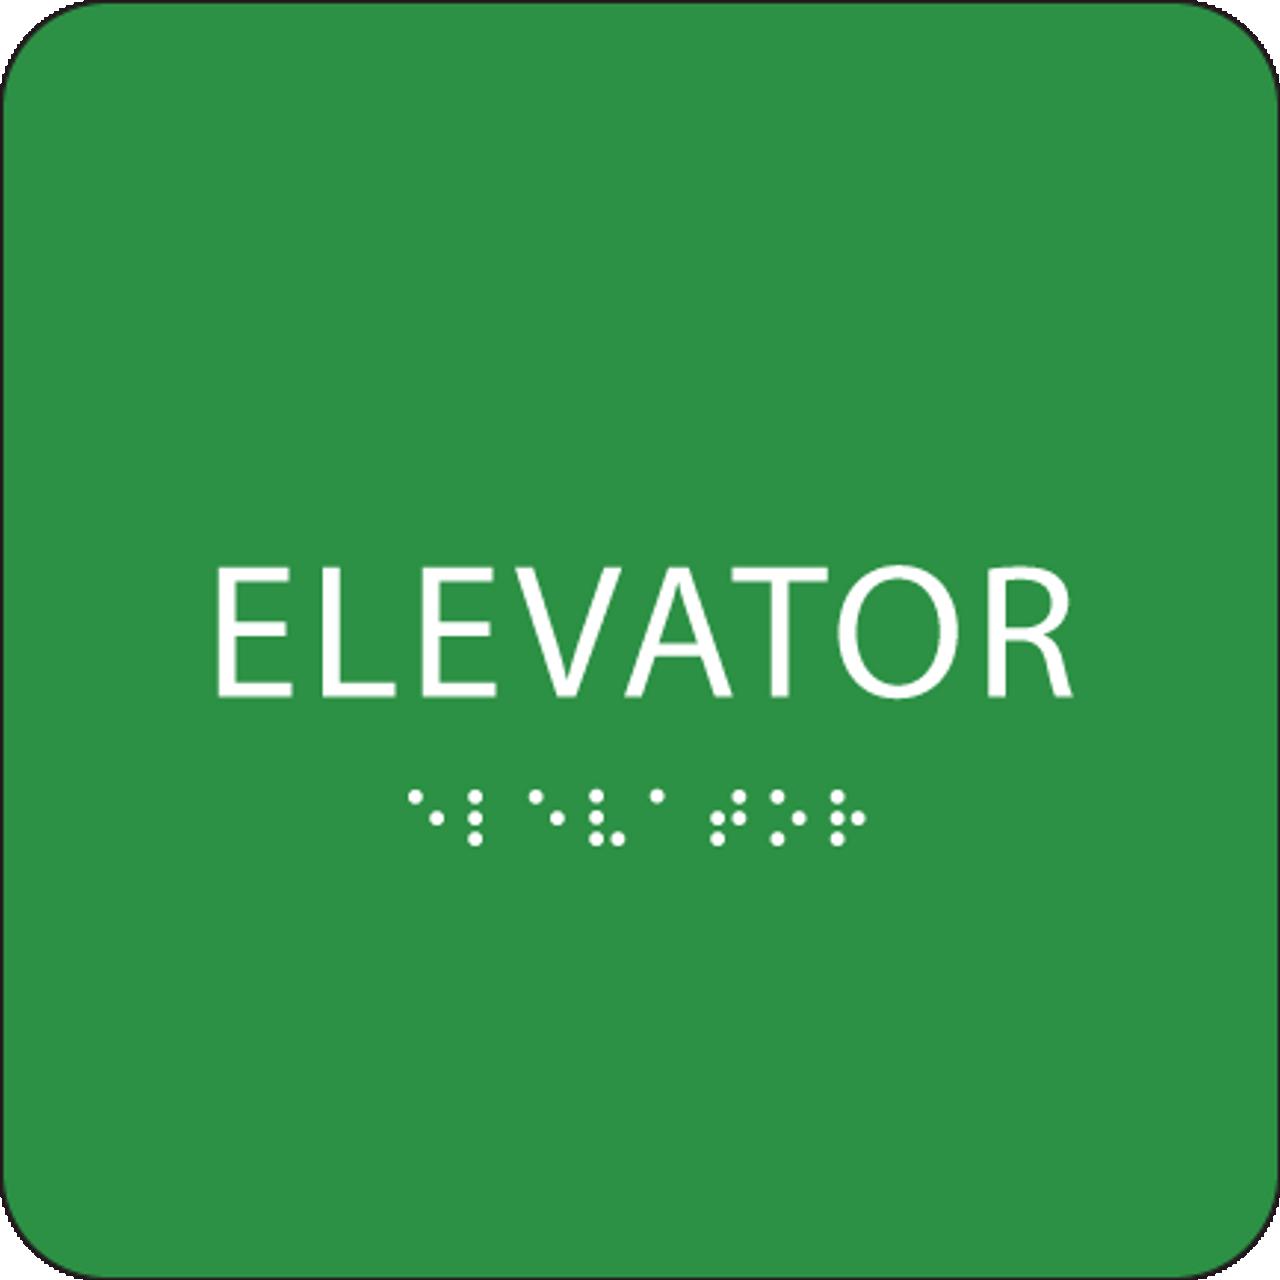 Green Braille Elevator Sign